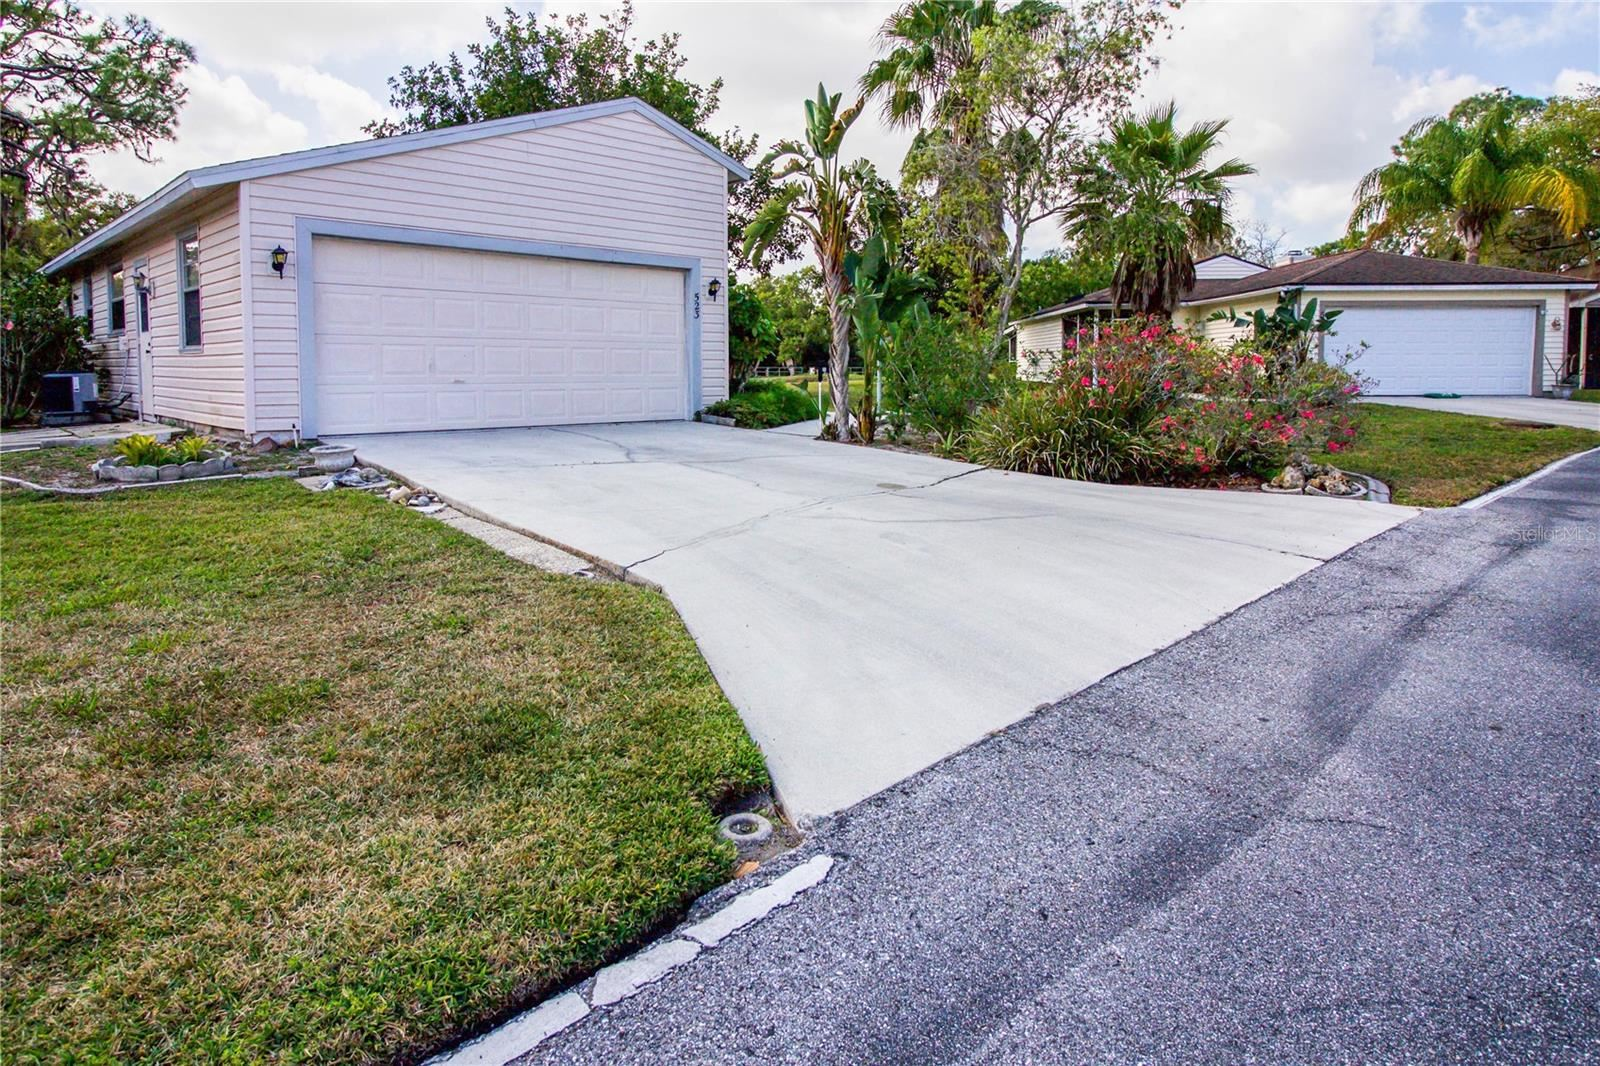 523 BEARDED OAKS CIRCLE, Sarasota, FL 34232 - #: U8128983